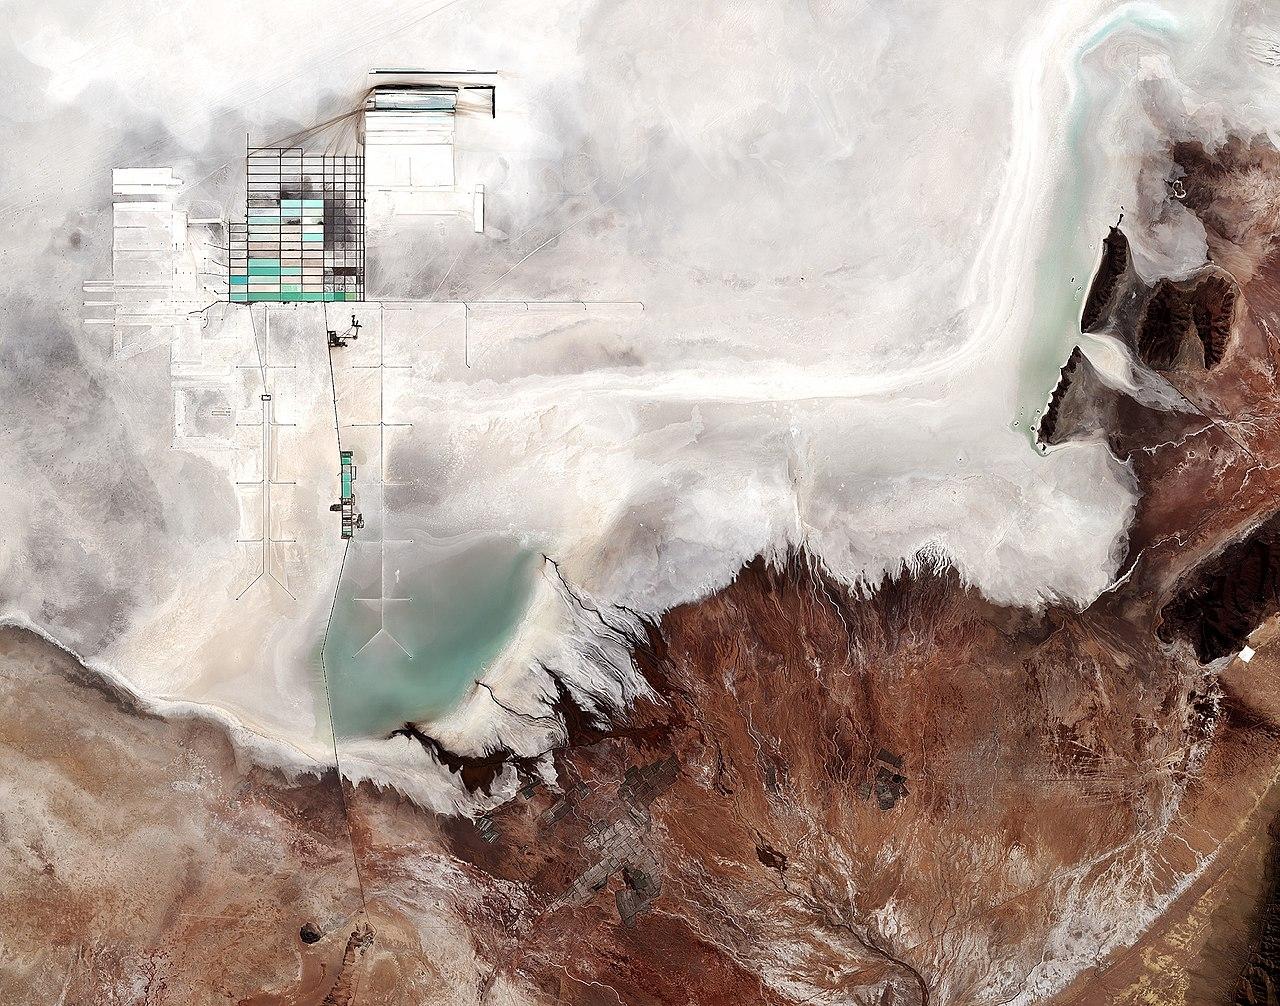 1280px-Uyuni_salt_flat,_Bolivia_ESA380675